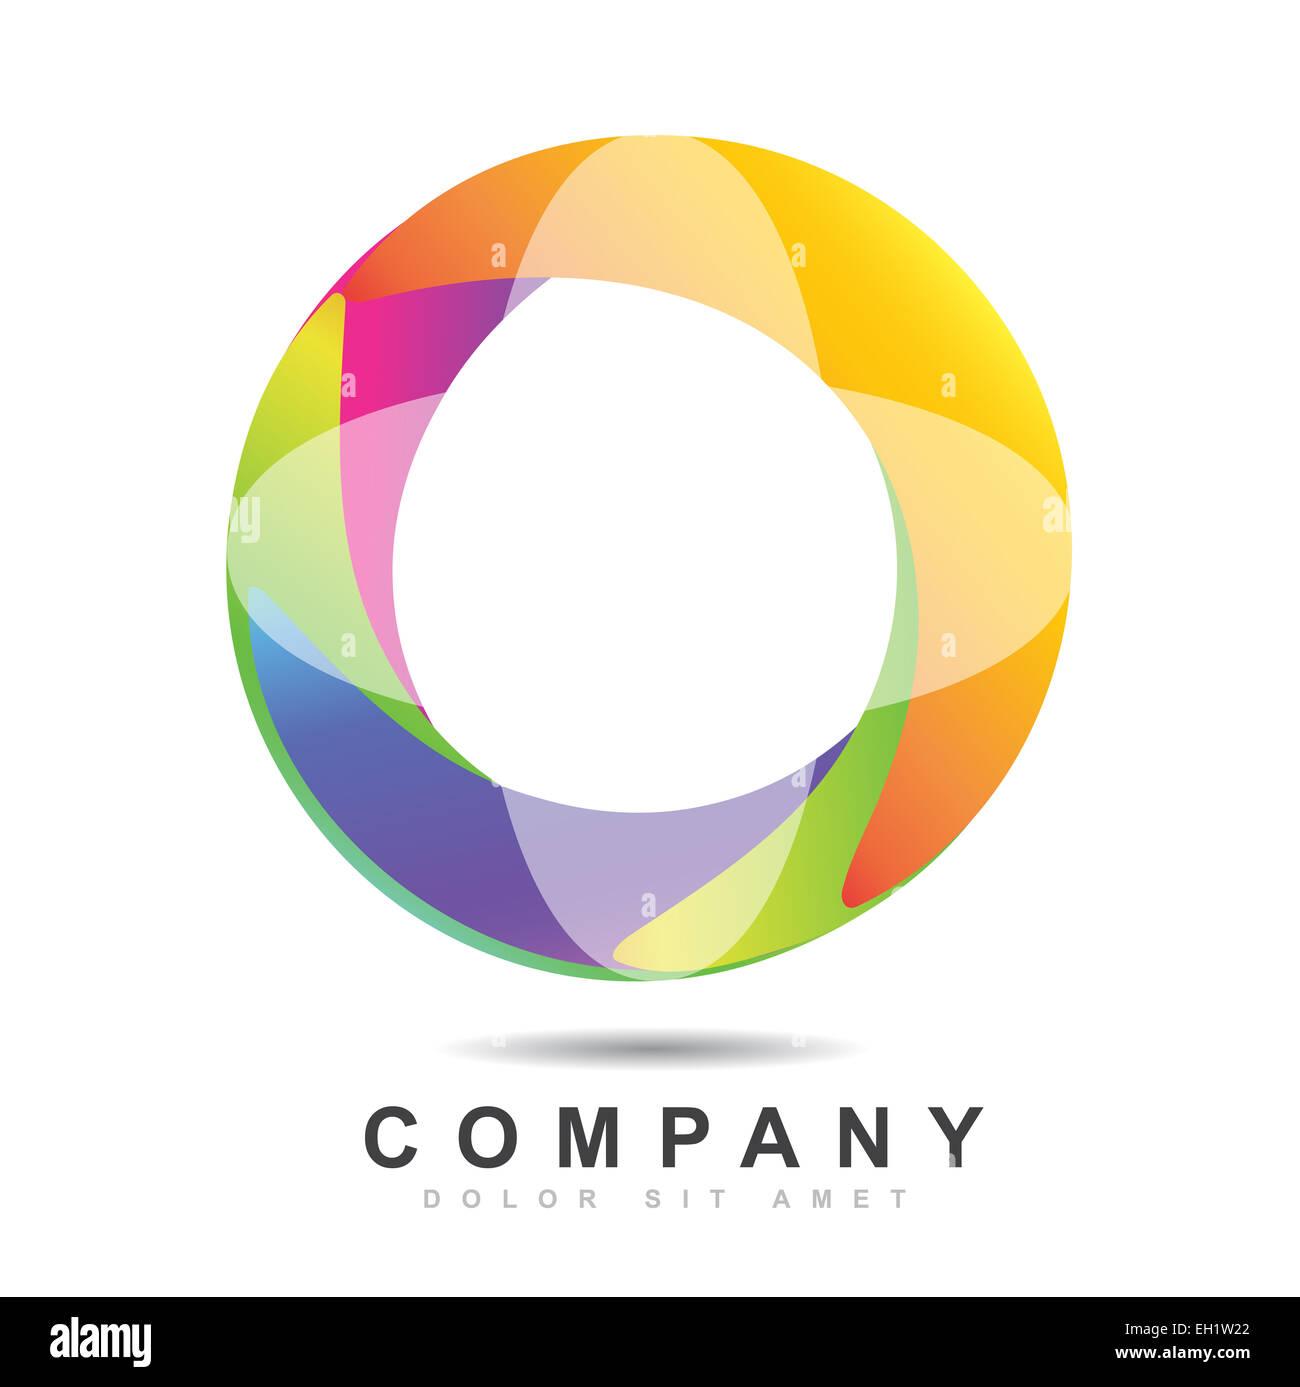 template of a circle logo icon vector 3d stock photo 79332234 alamy